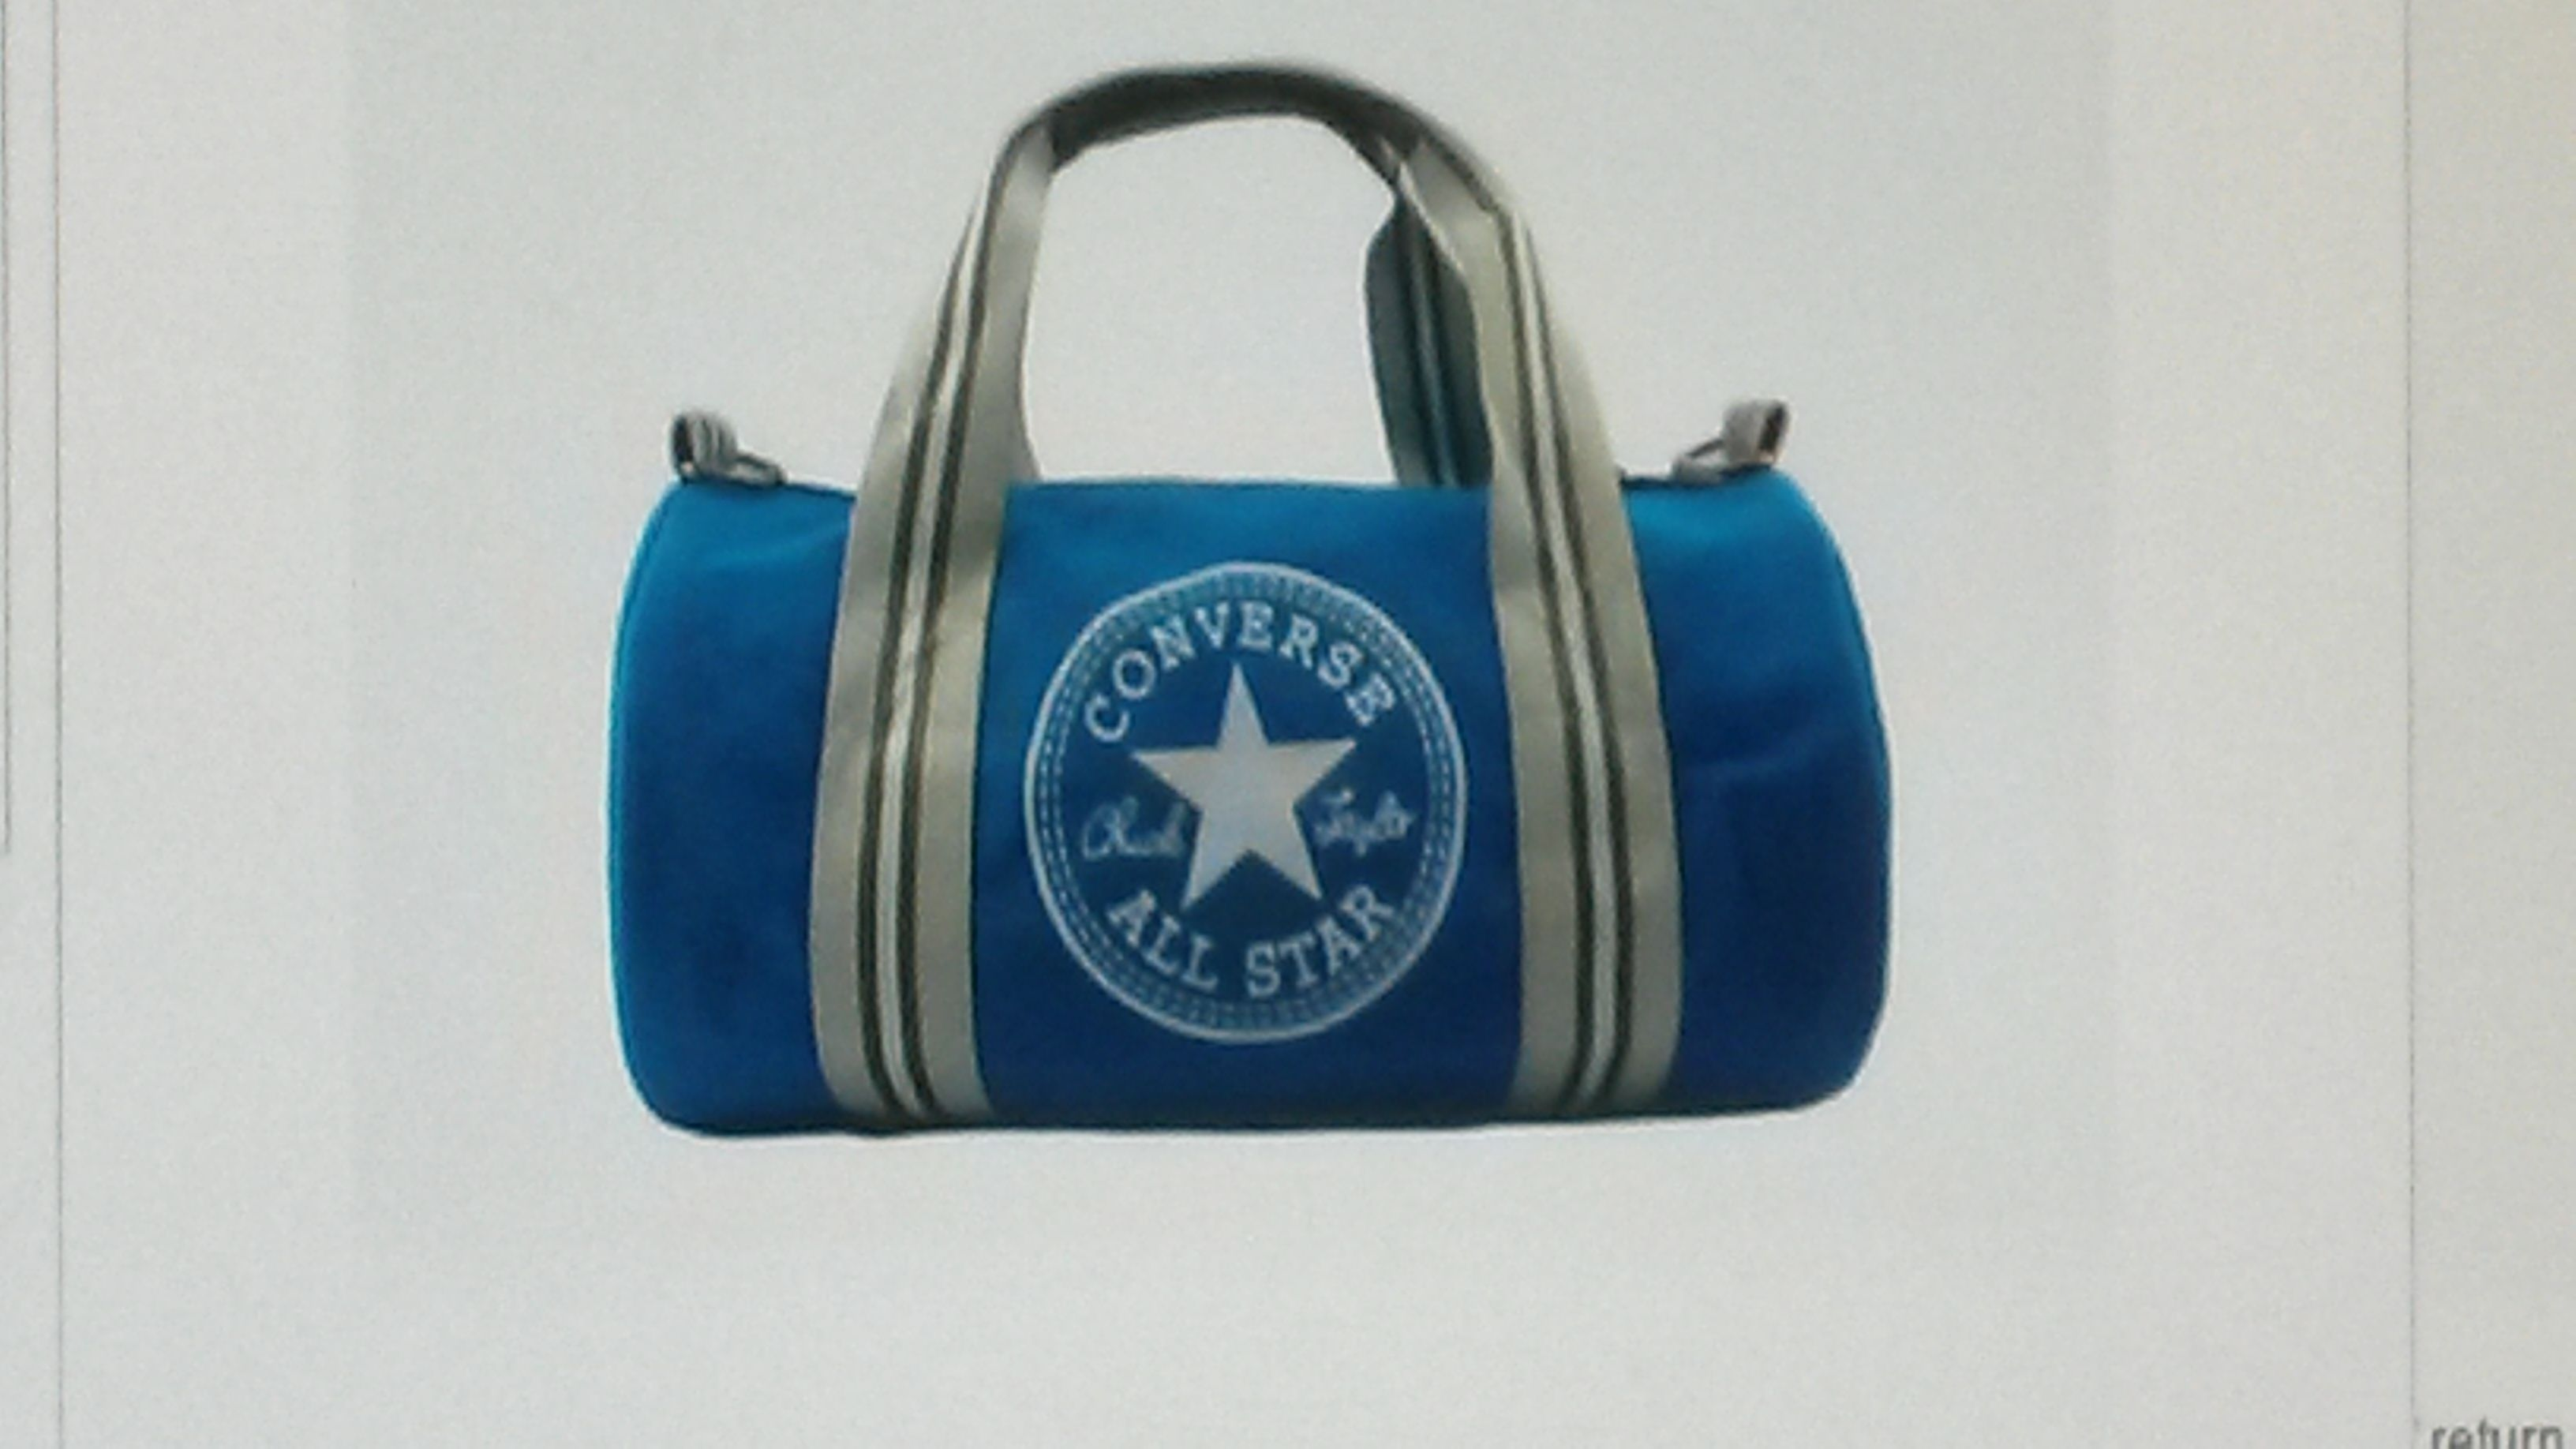 converse bag blue